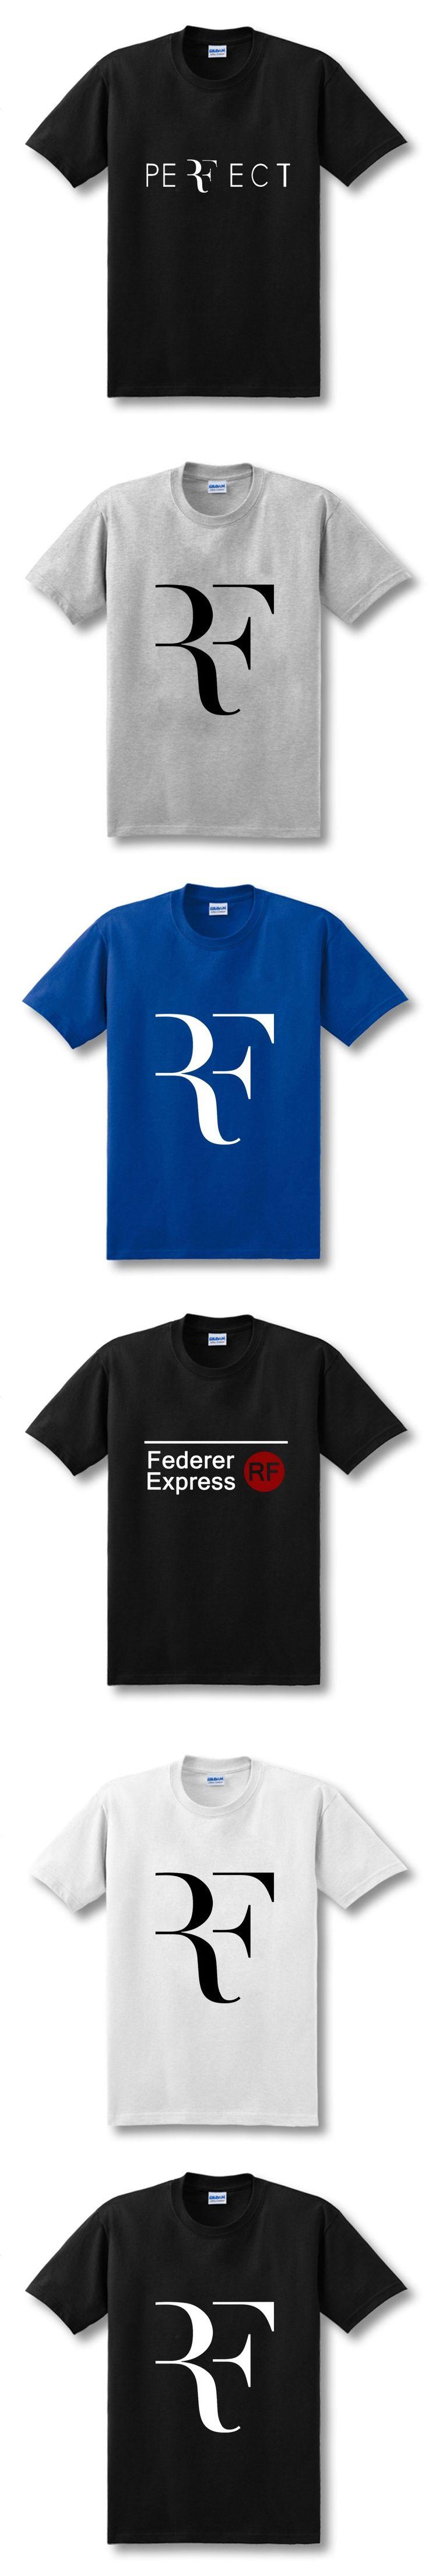 2018 New Summer Fashion Roger Federer RF T Shirt Men Cotton Casual Short Sleeve Printed T-shirt Top Tees  Size XS-XXL